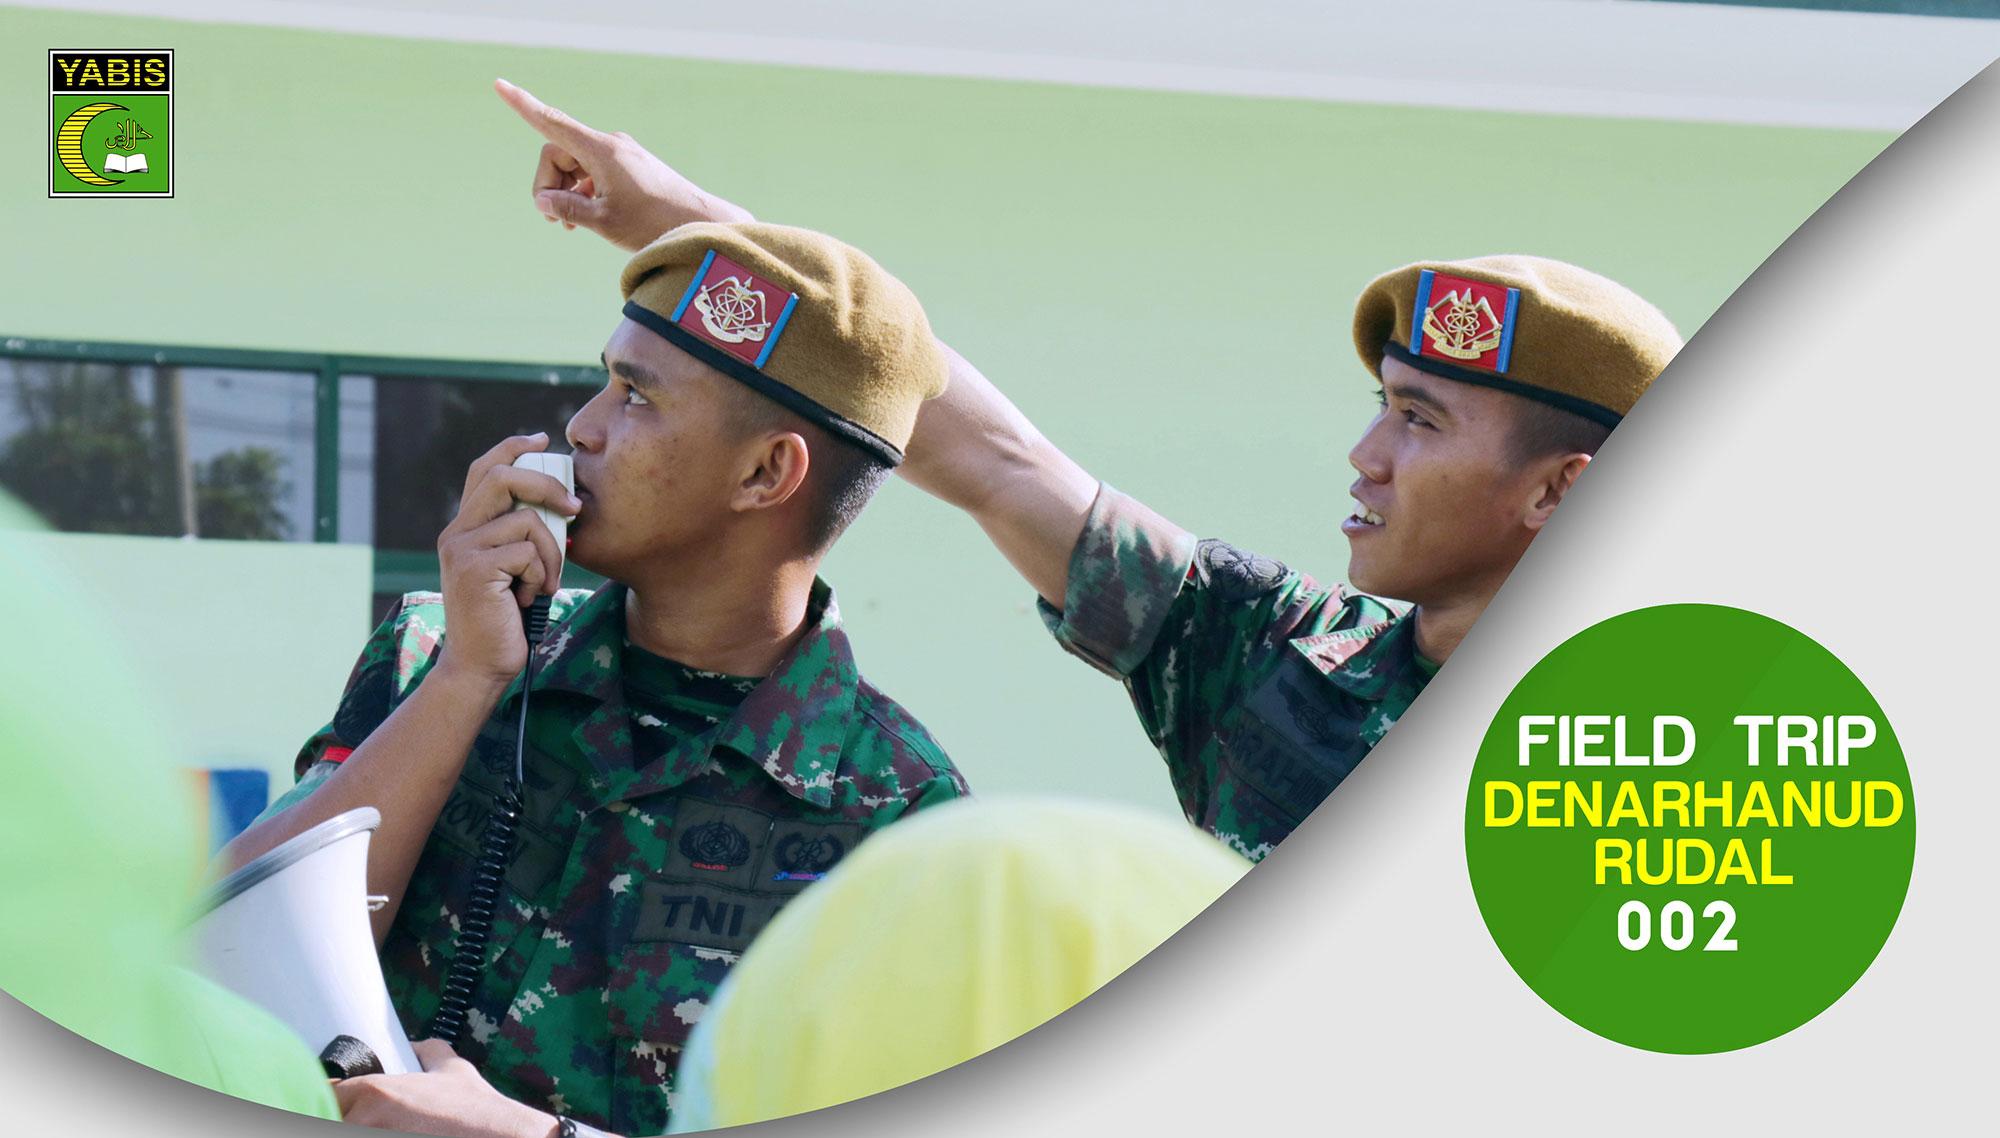 Field Trip, Kunjungan Markas Denarhanud RUDAL 002